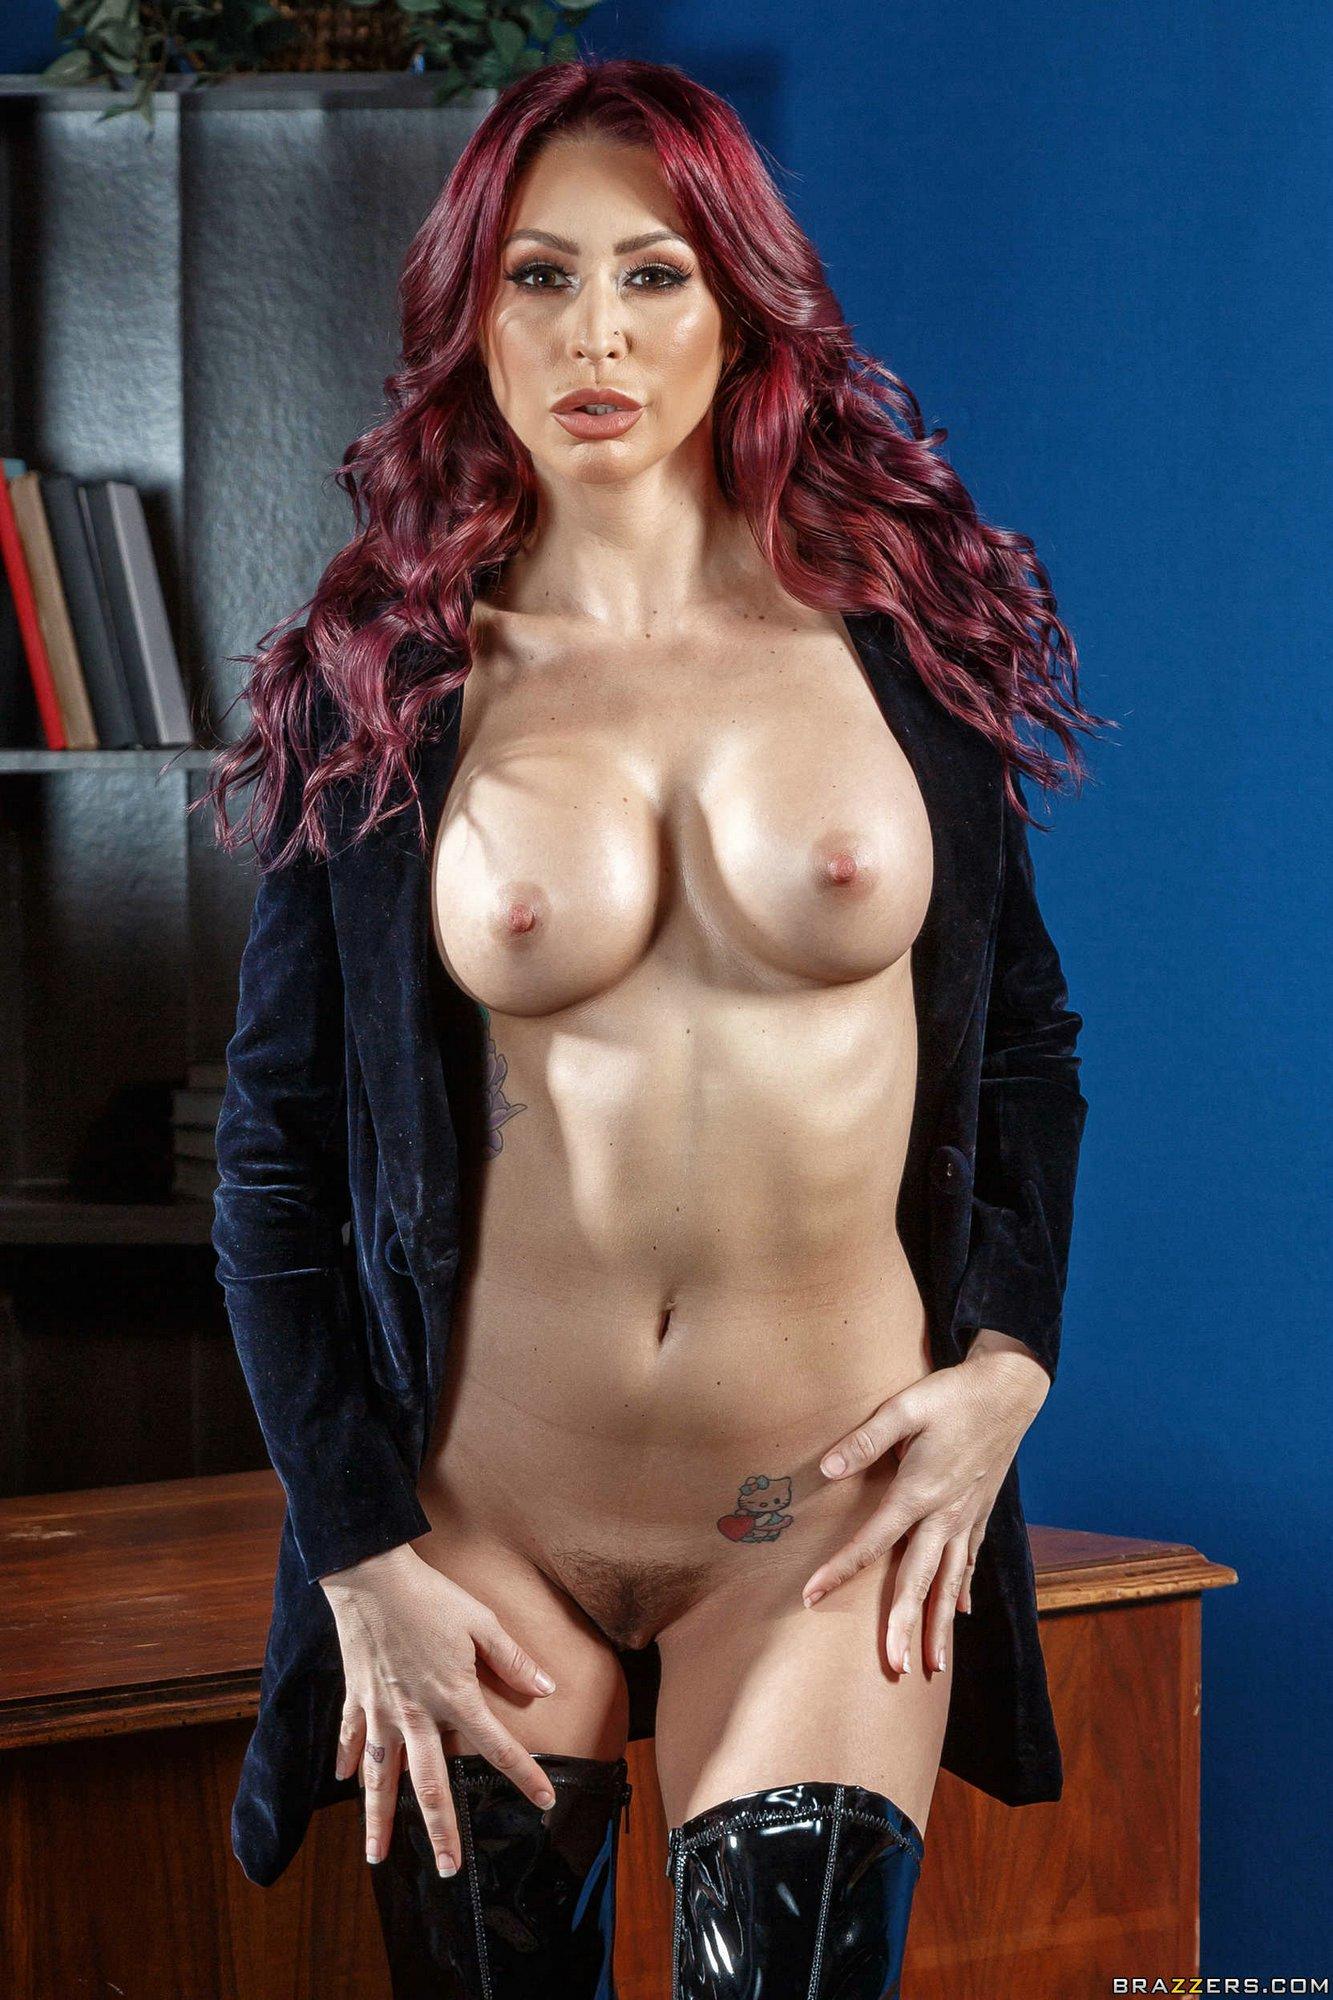 Jessica monique topless nude celebrity photos